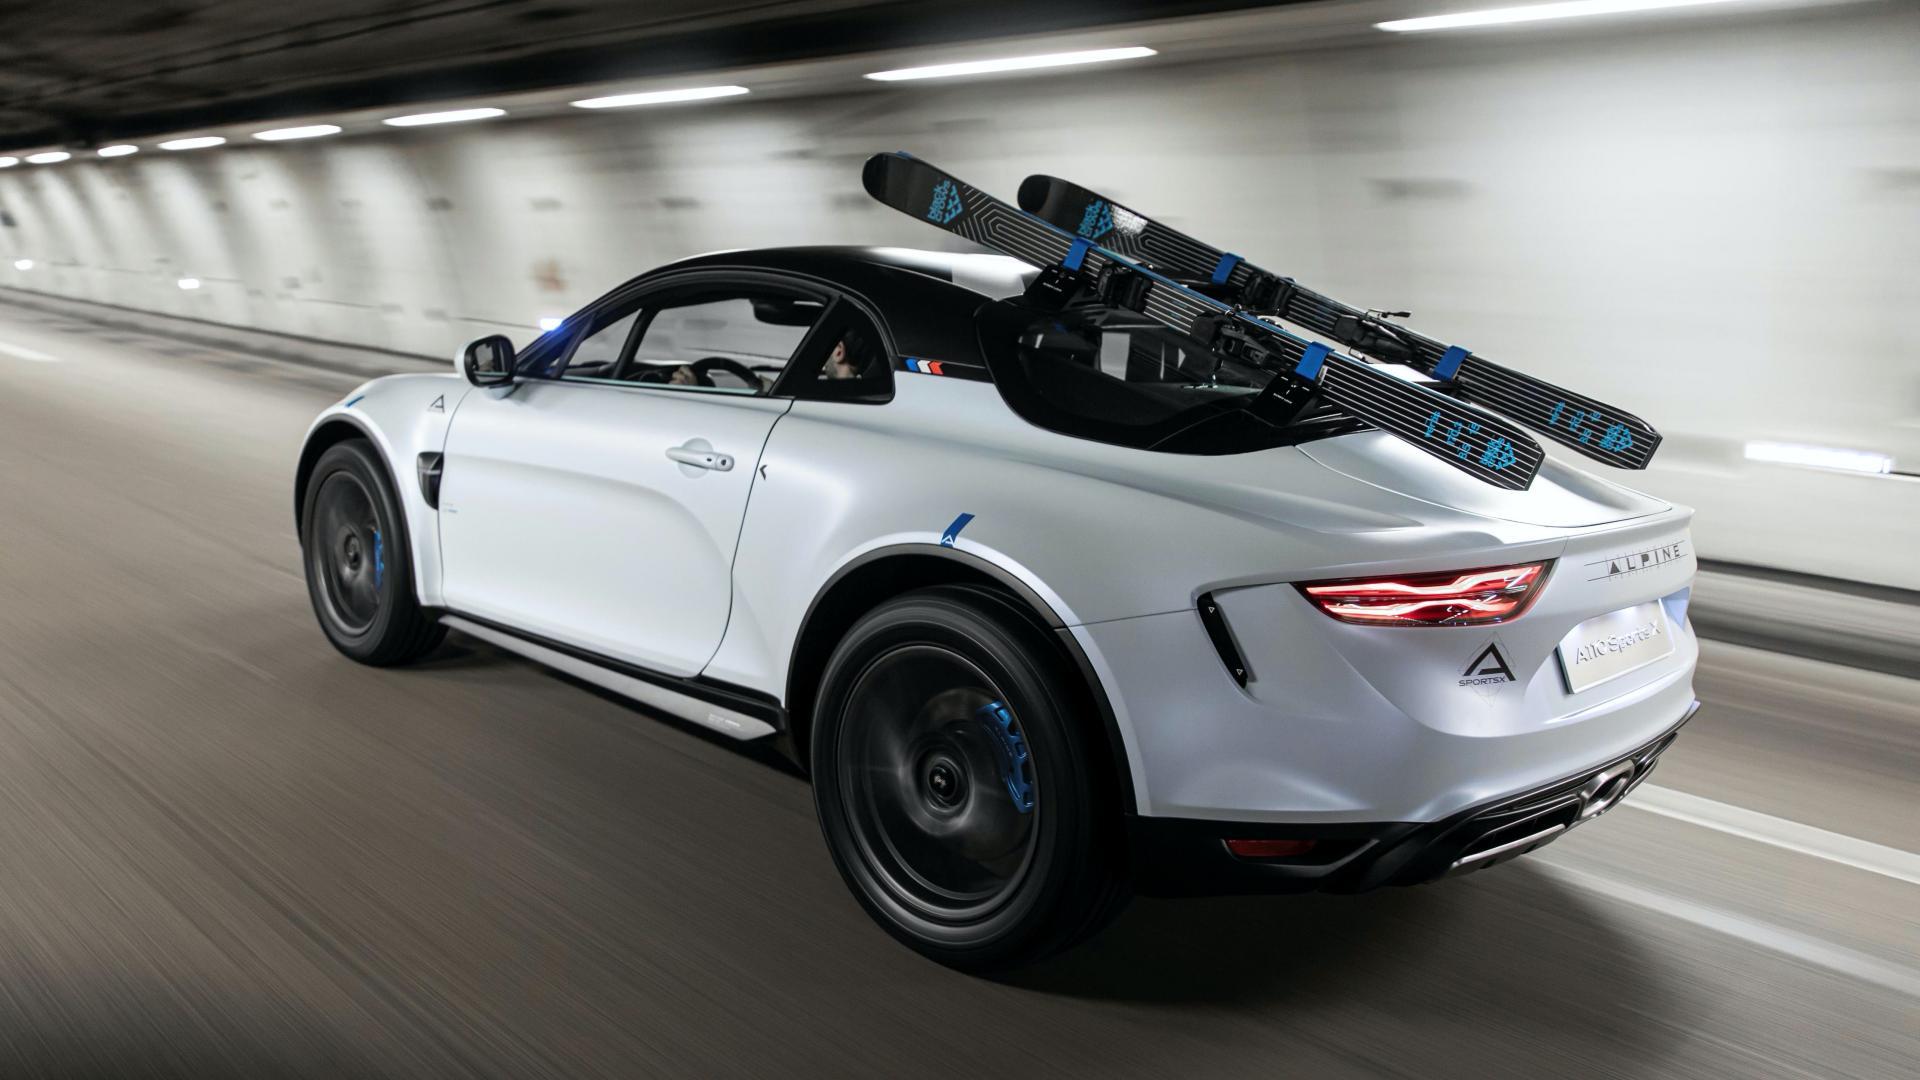 Alpine-A110-SportsX-6